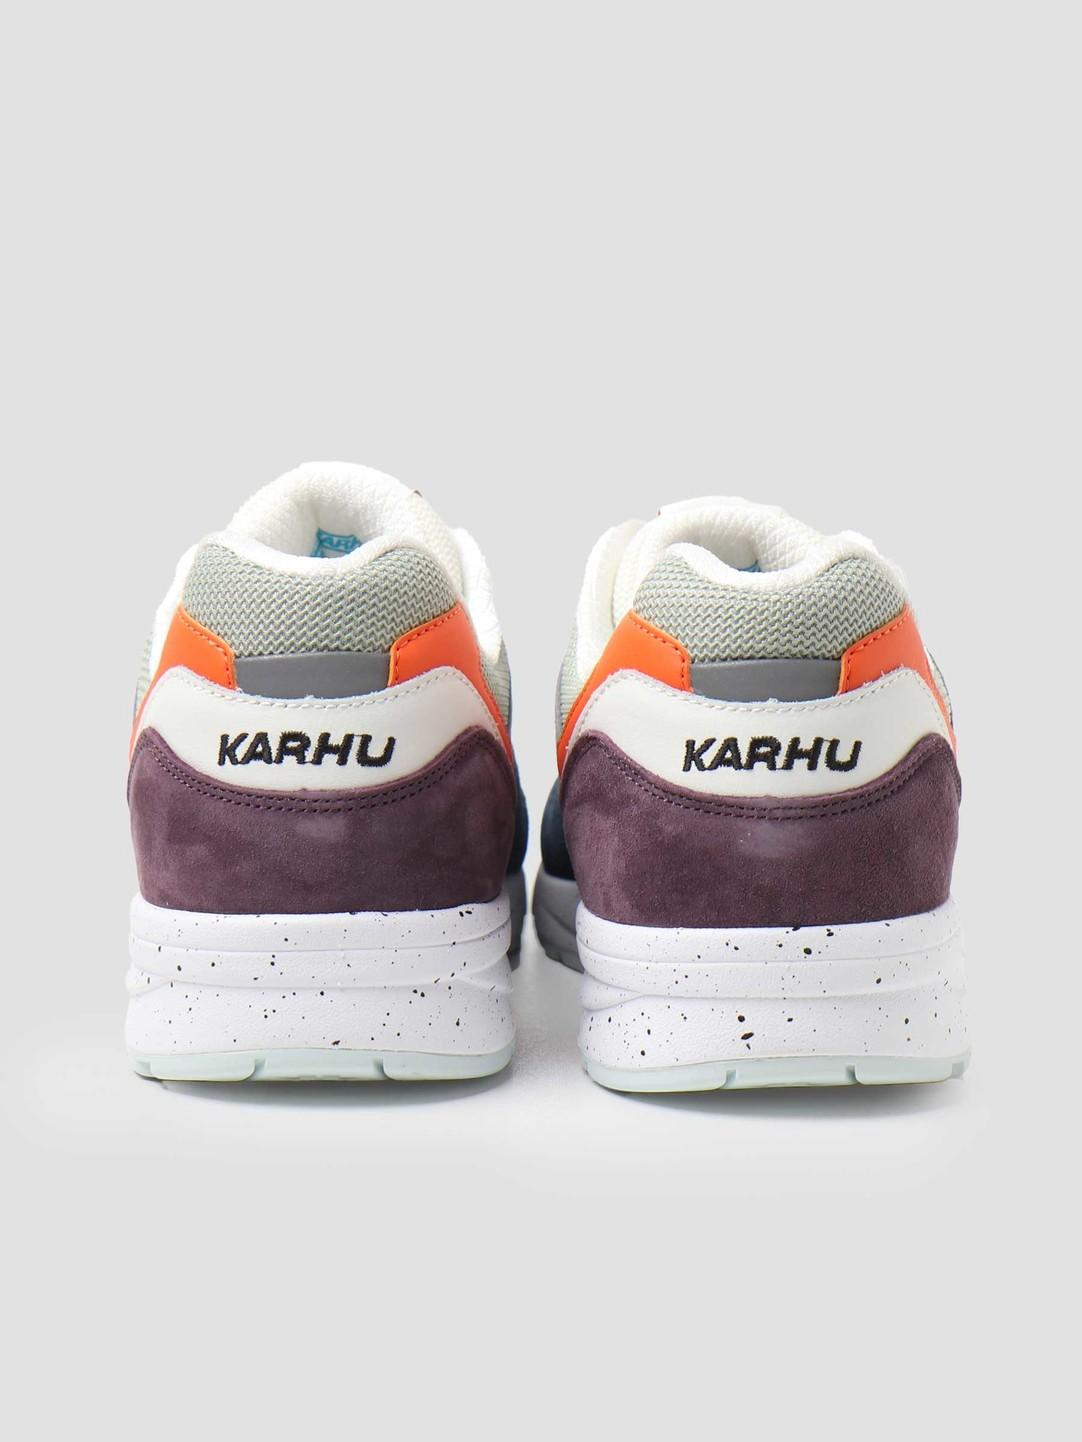 Karhu Karhu Legacy 96 Ensign Blue Lily White F806017